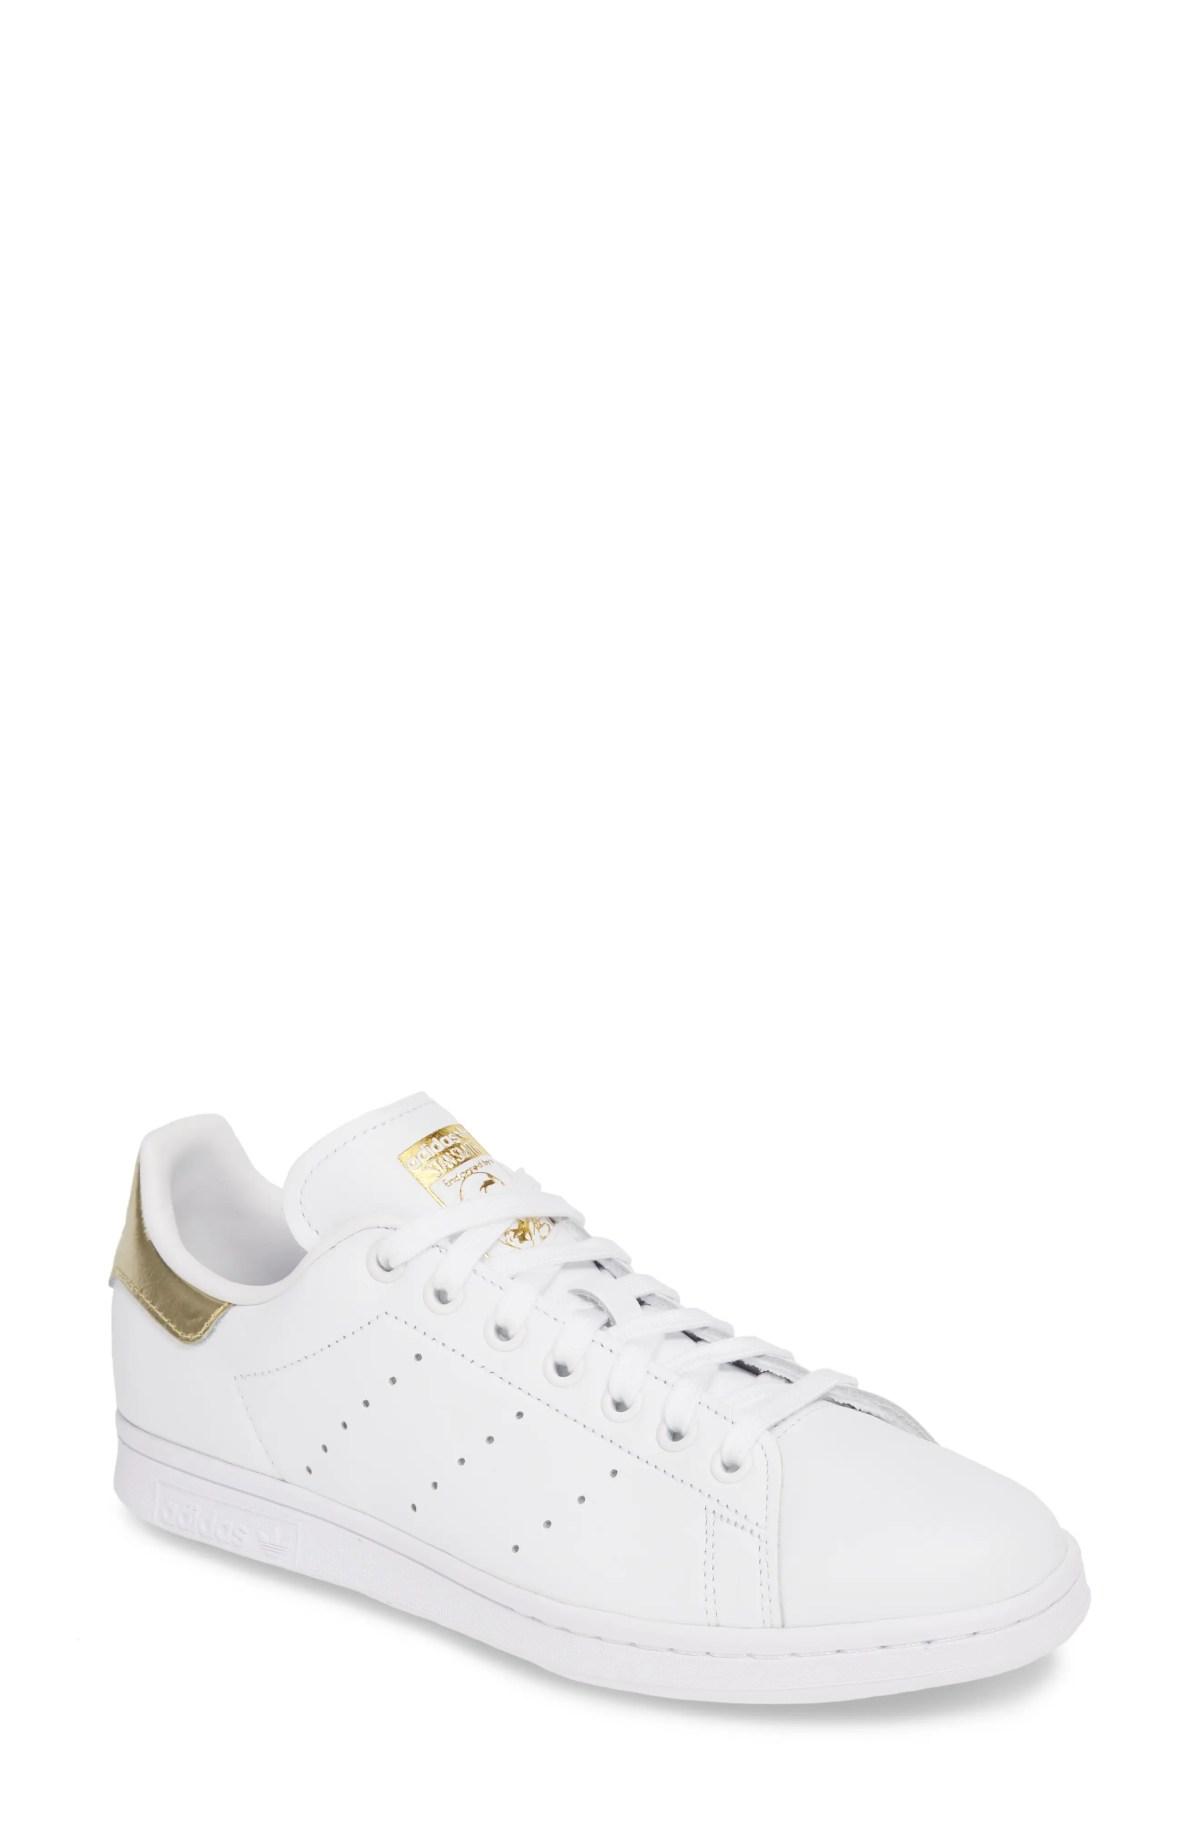 ADIDAS Stan Smith Sneaker, Main, color, WHITE/ WHITE/ GOLD